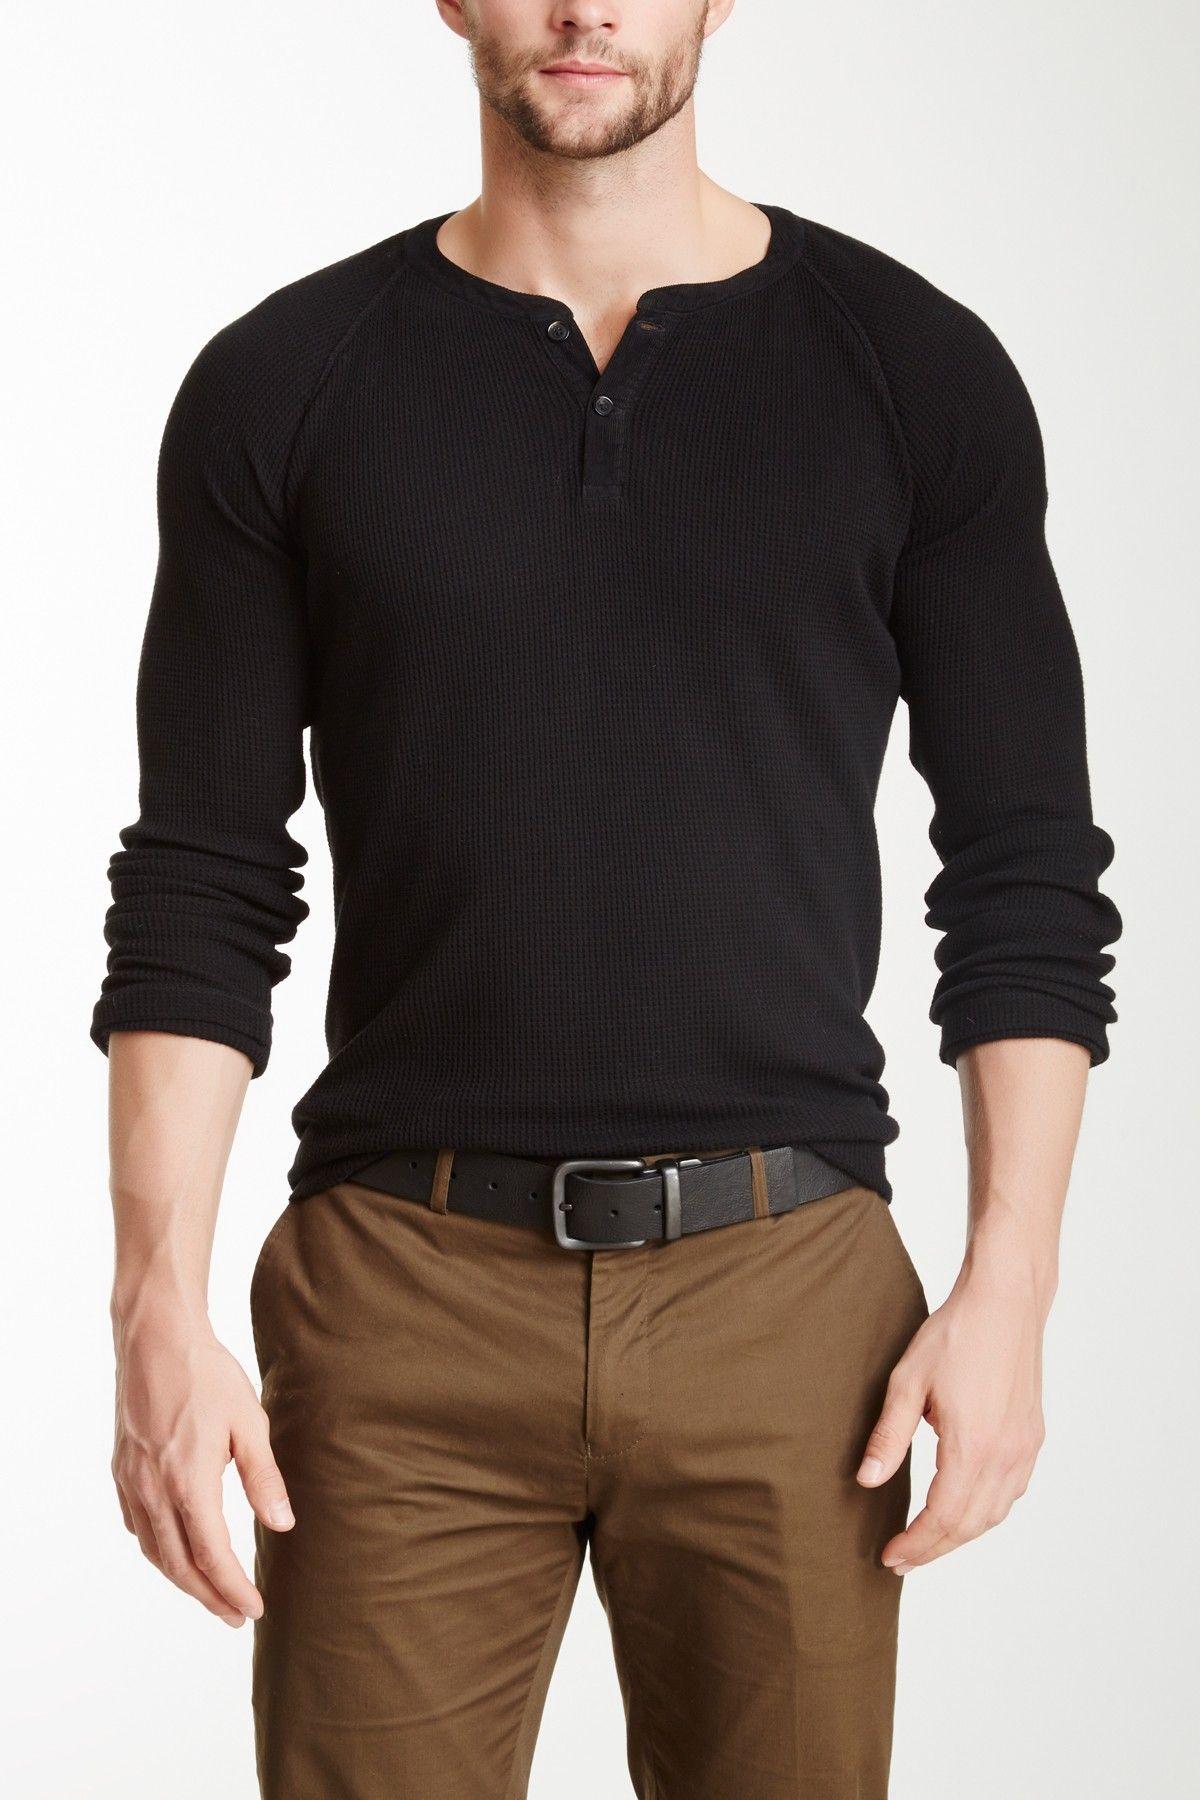 Billy Reid Thermal Henley Shirt Shirtmen Shirts Mens Outfits Mens Fashion Mens Fashion Rugged [ 1800 x 1200 Pixel ]